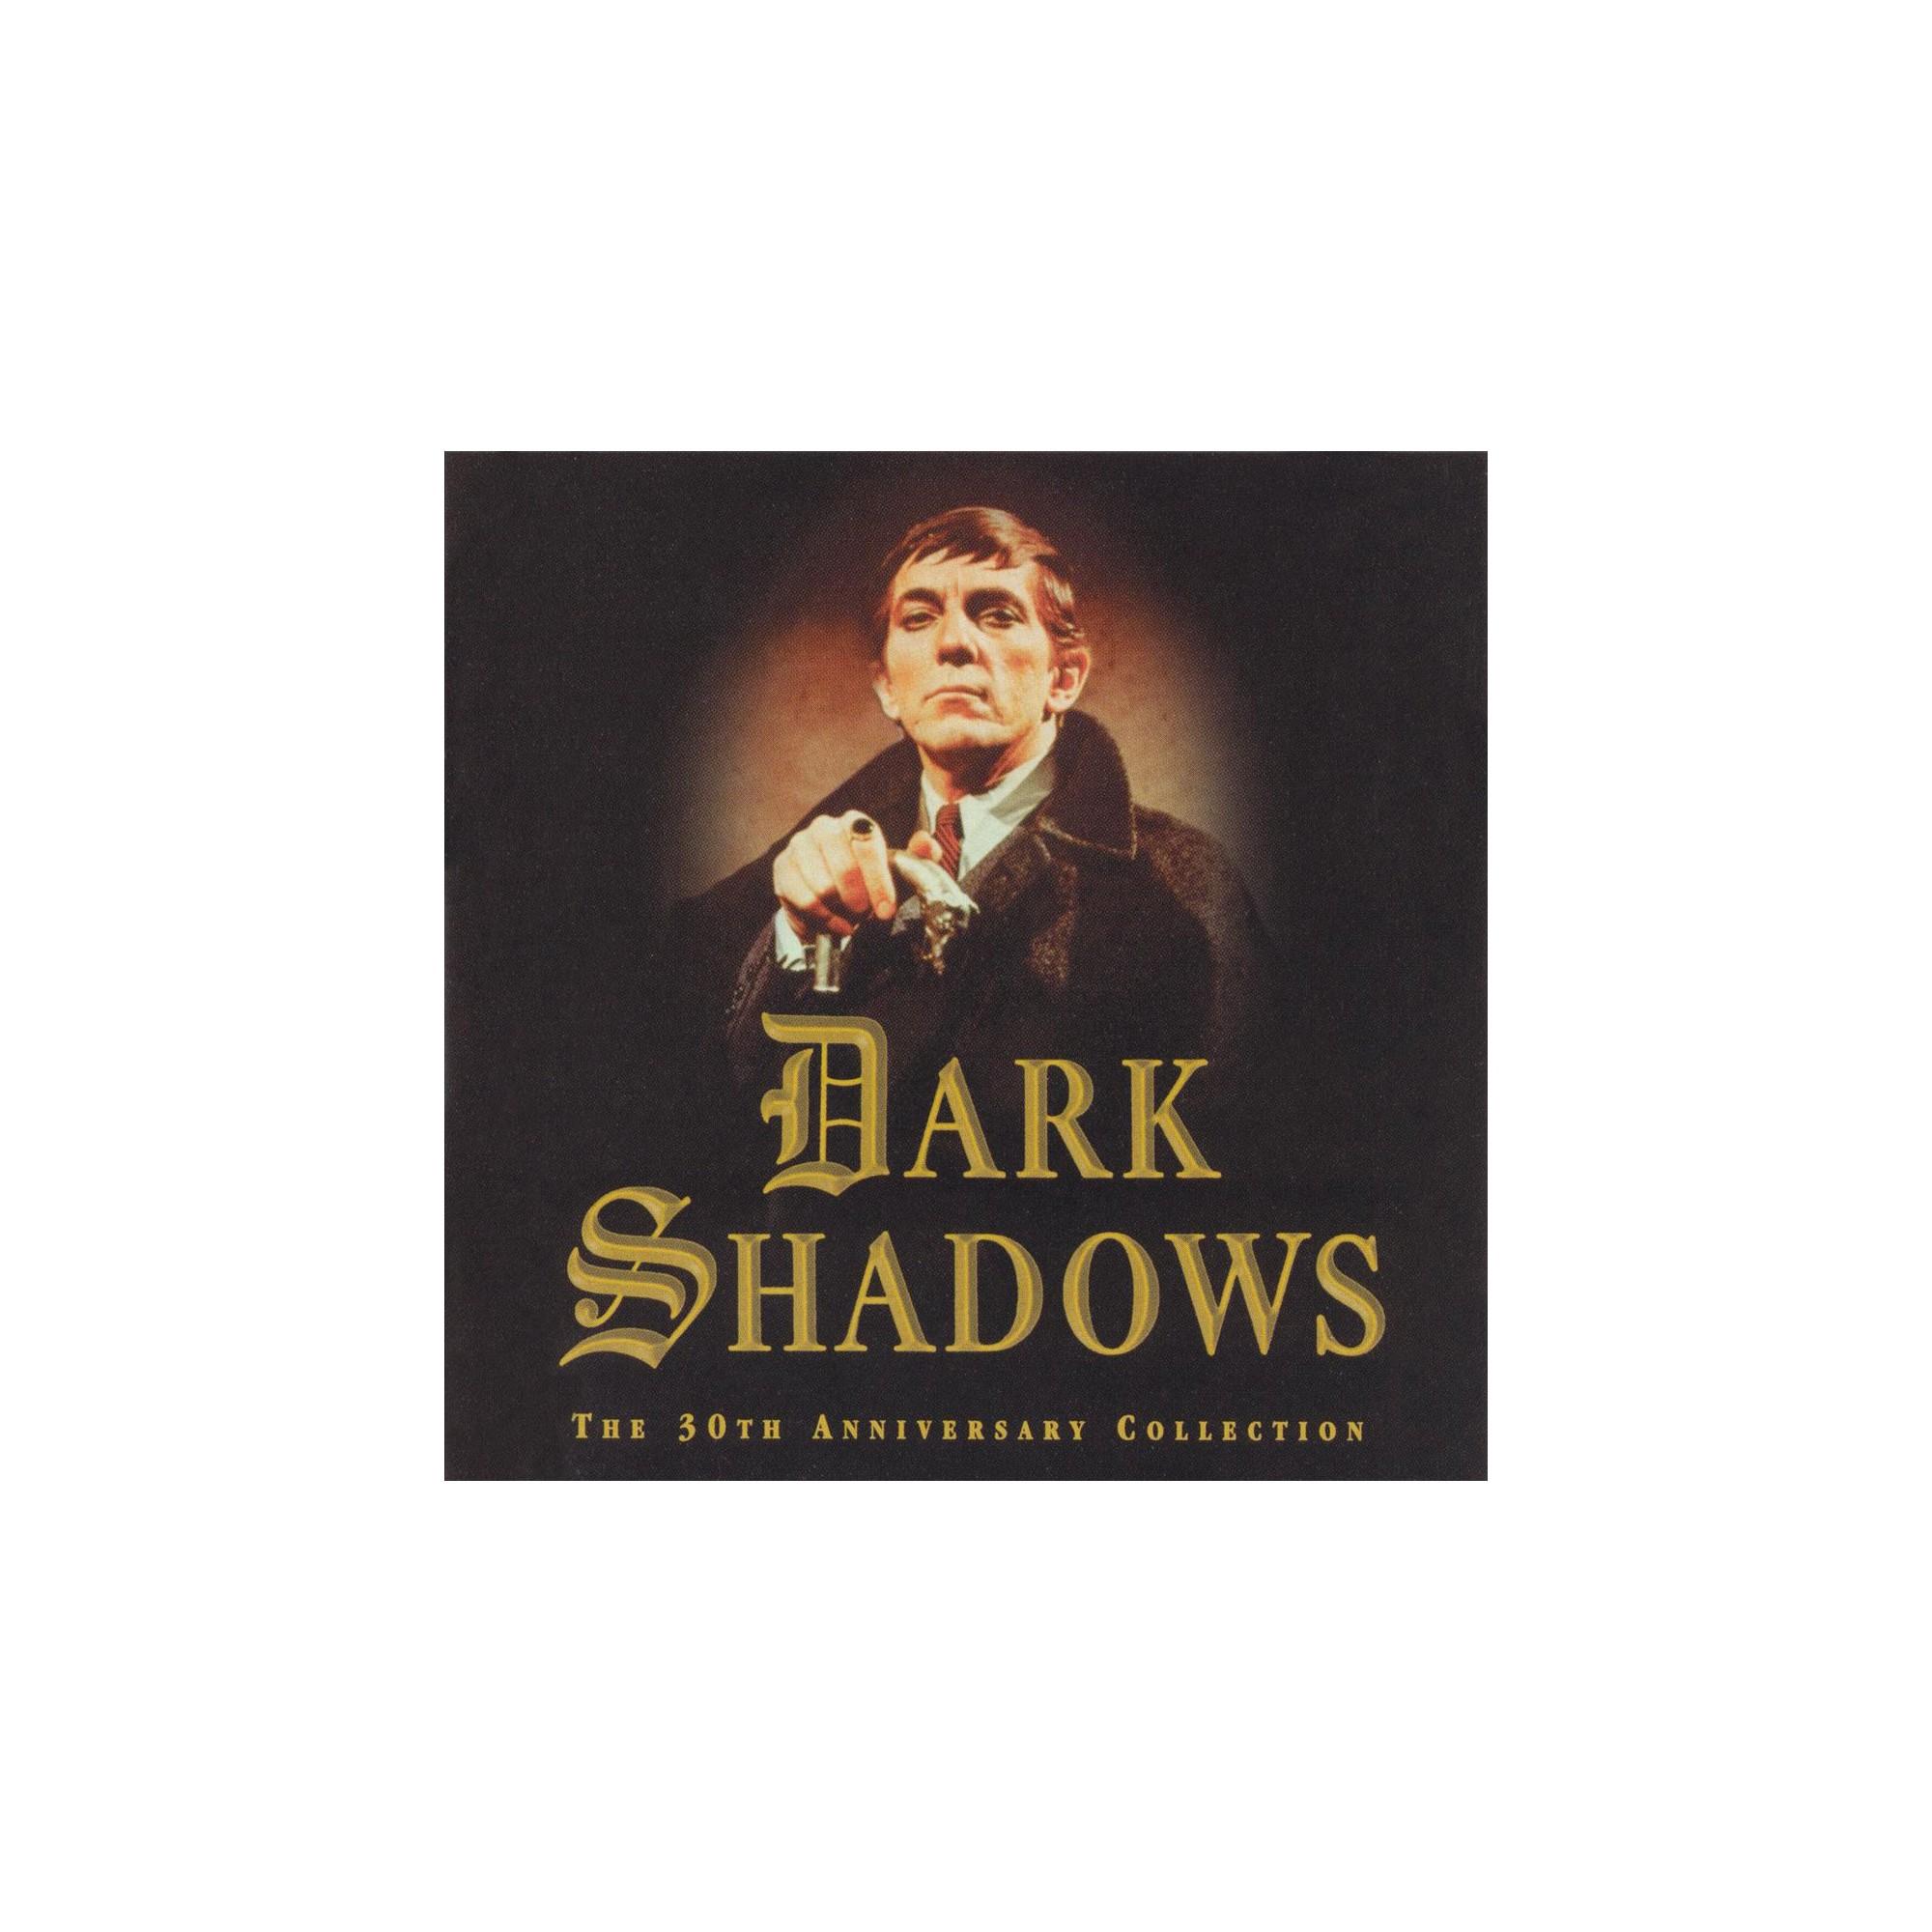 Dark shadows - Dark shadows:30th anniversary collect (CD)